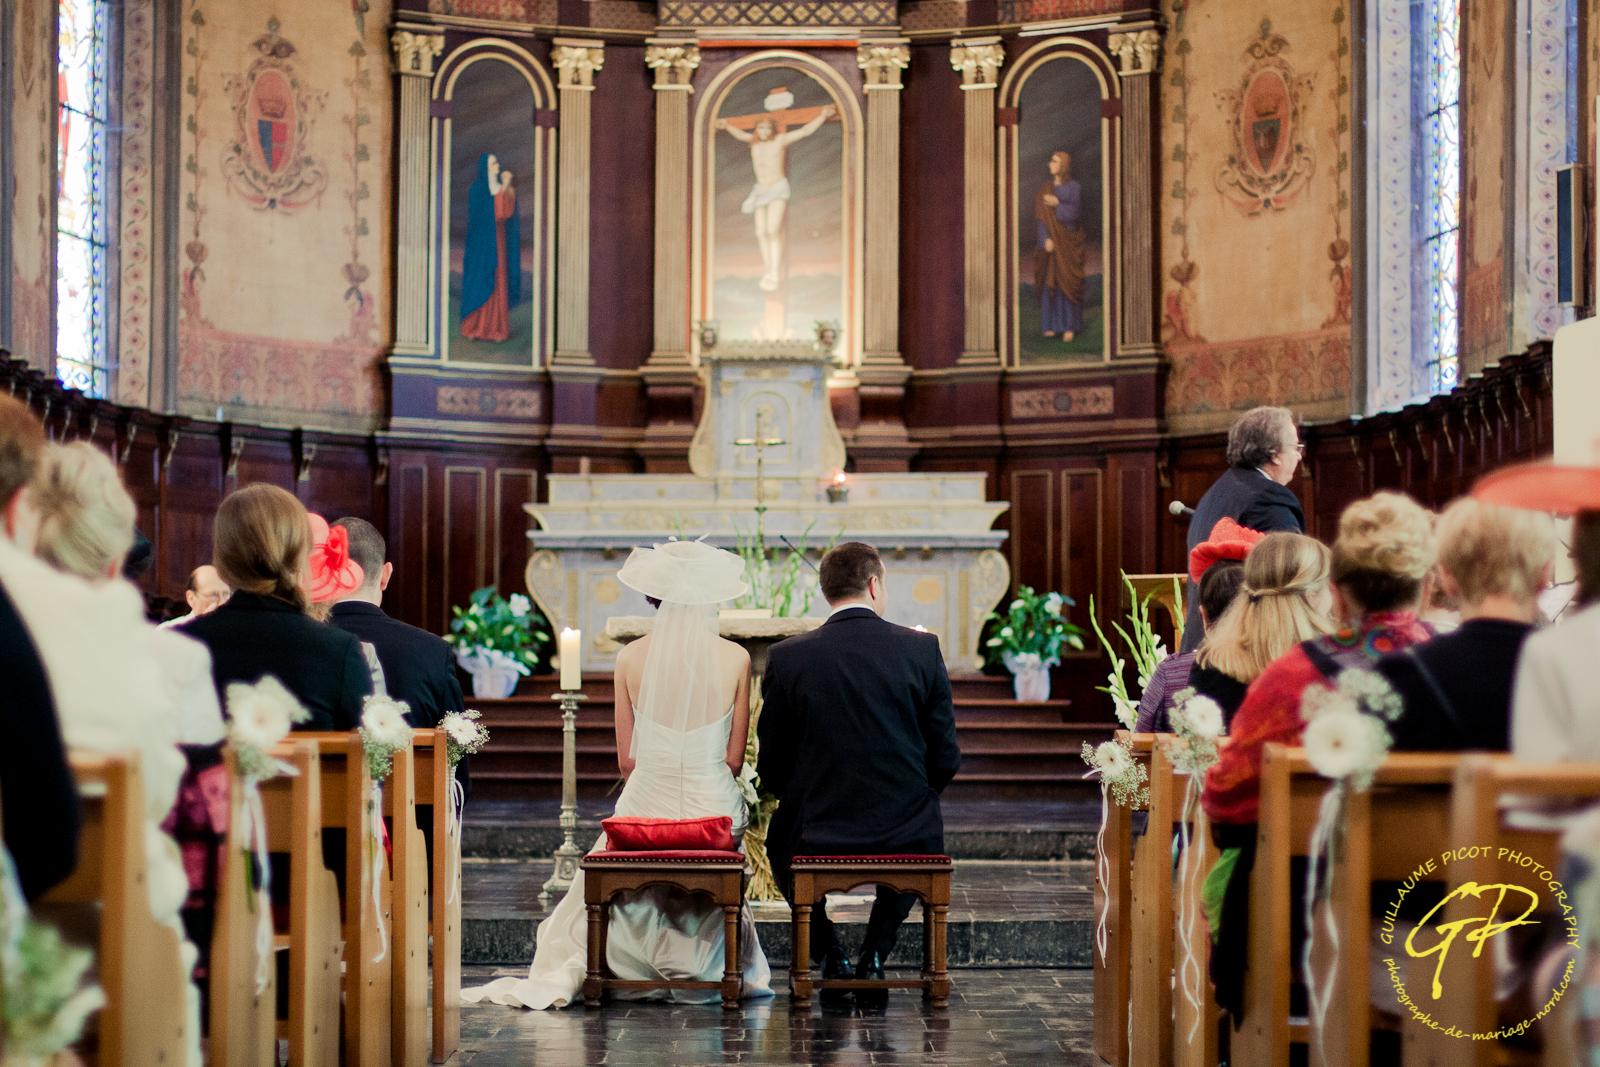 photographe mariage nord (56 sur 96)